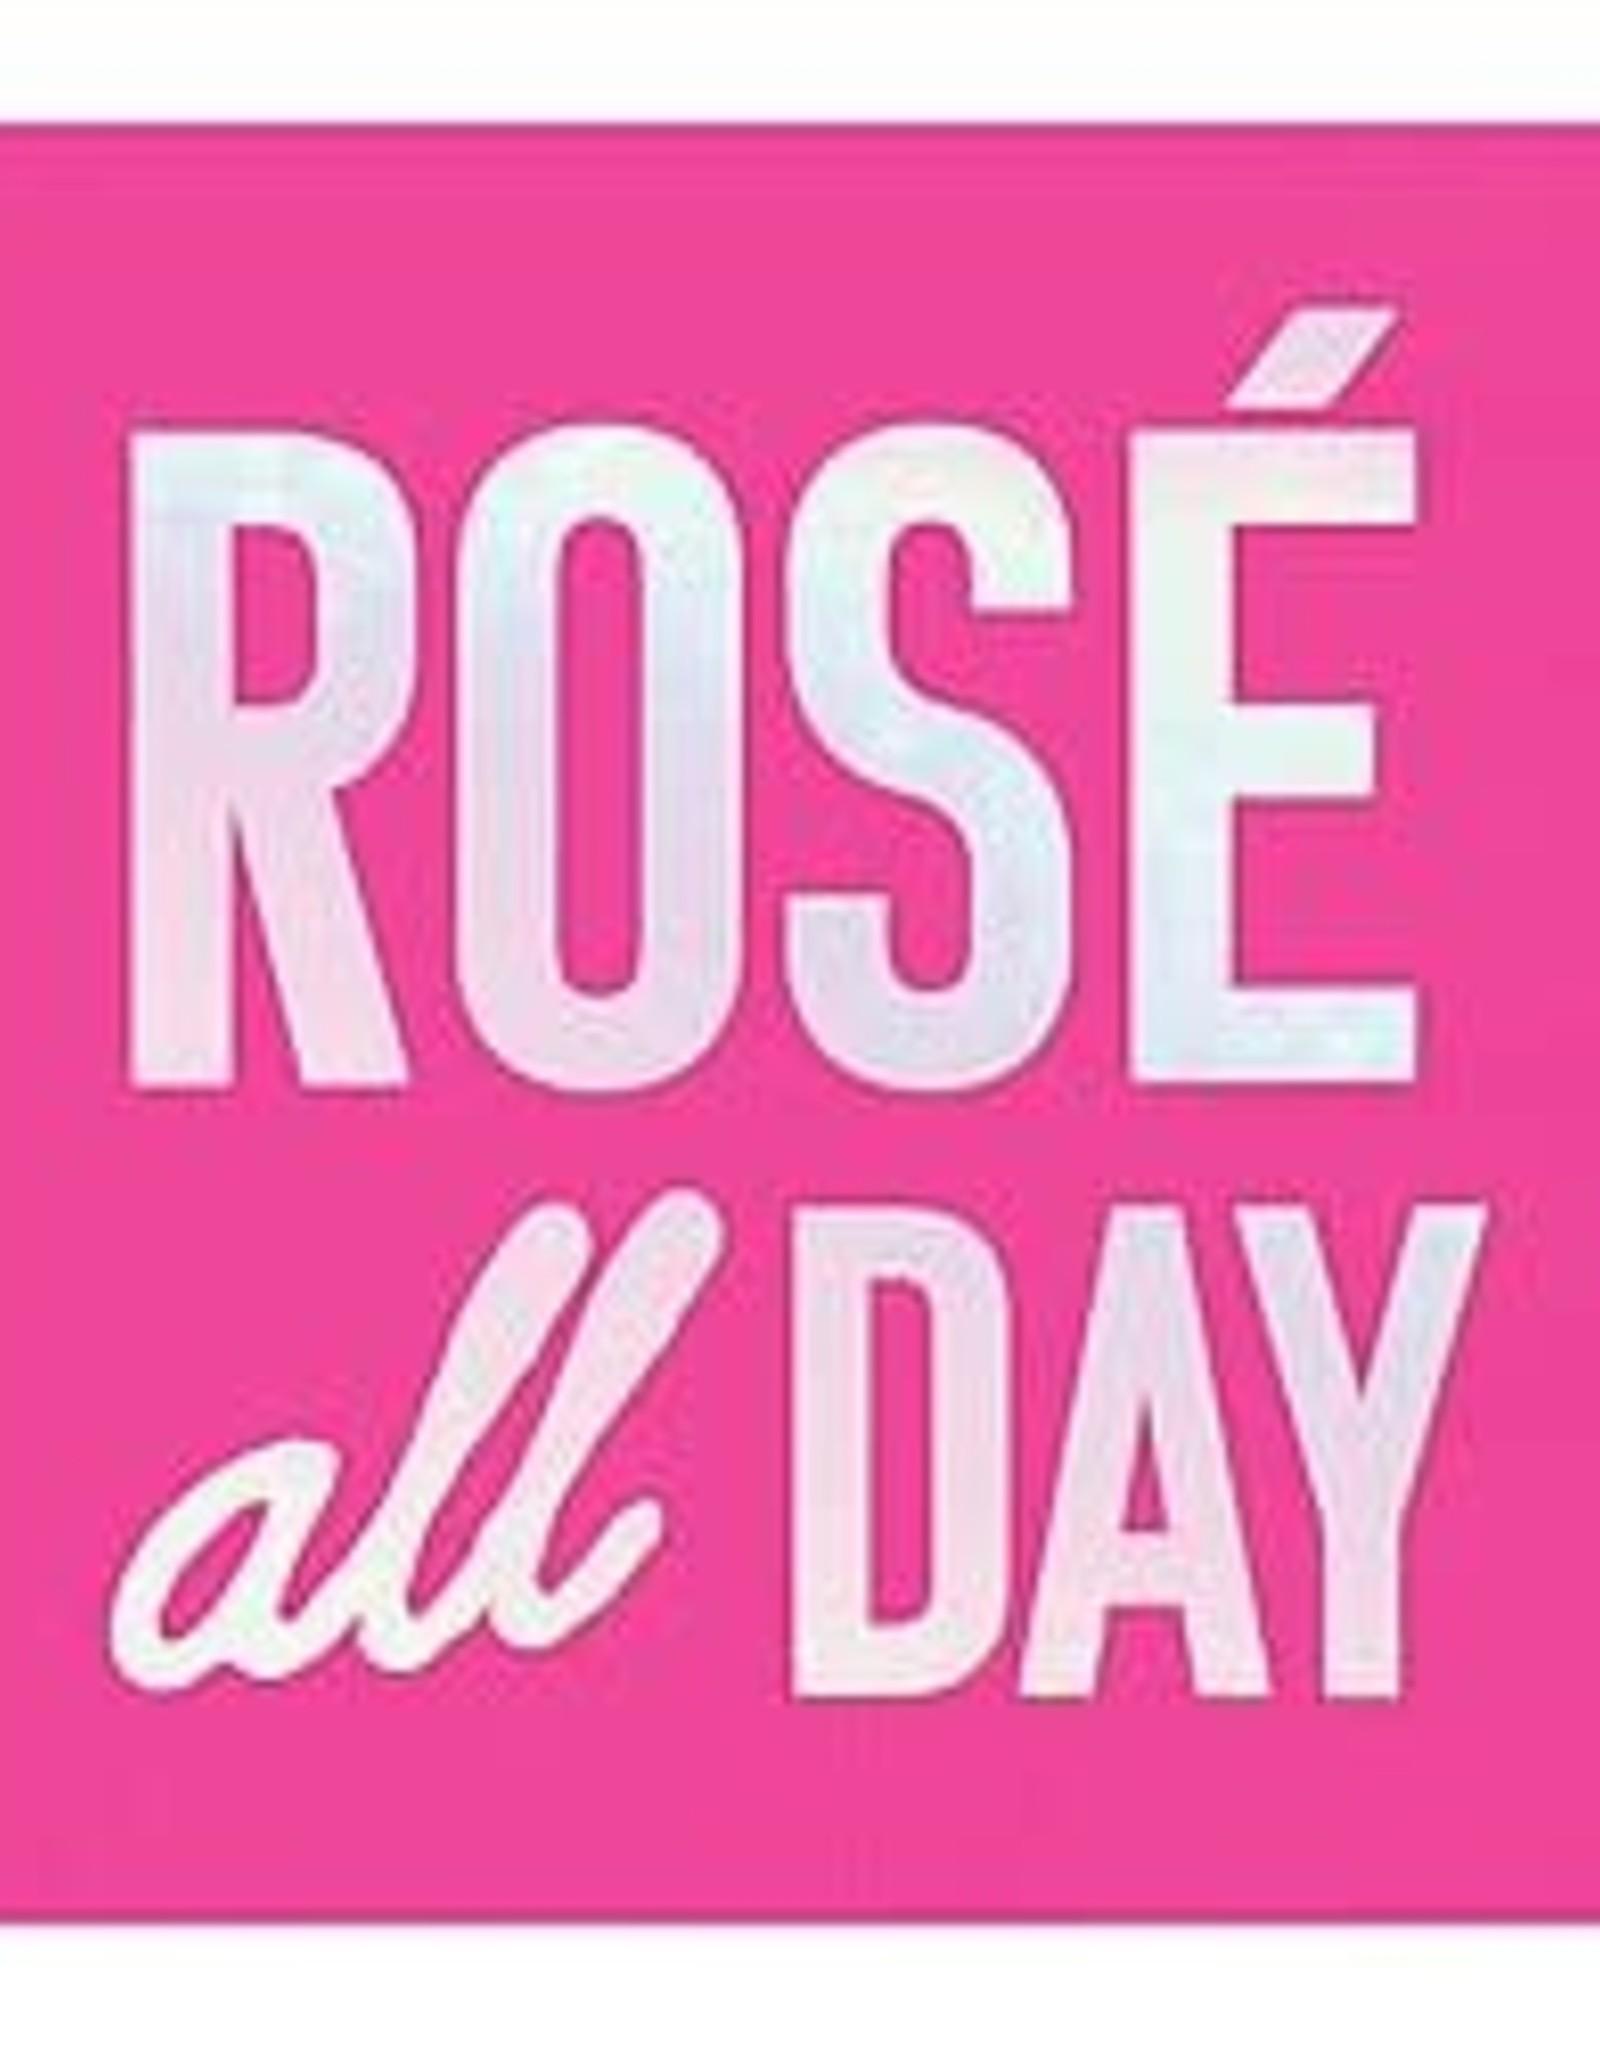 Slant Bev Napkin- Rose All Day Bright Pink